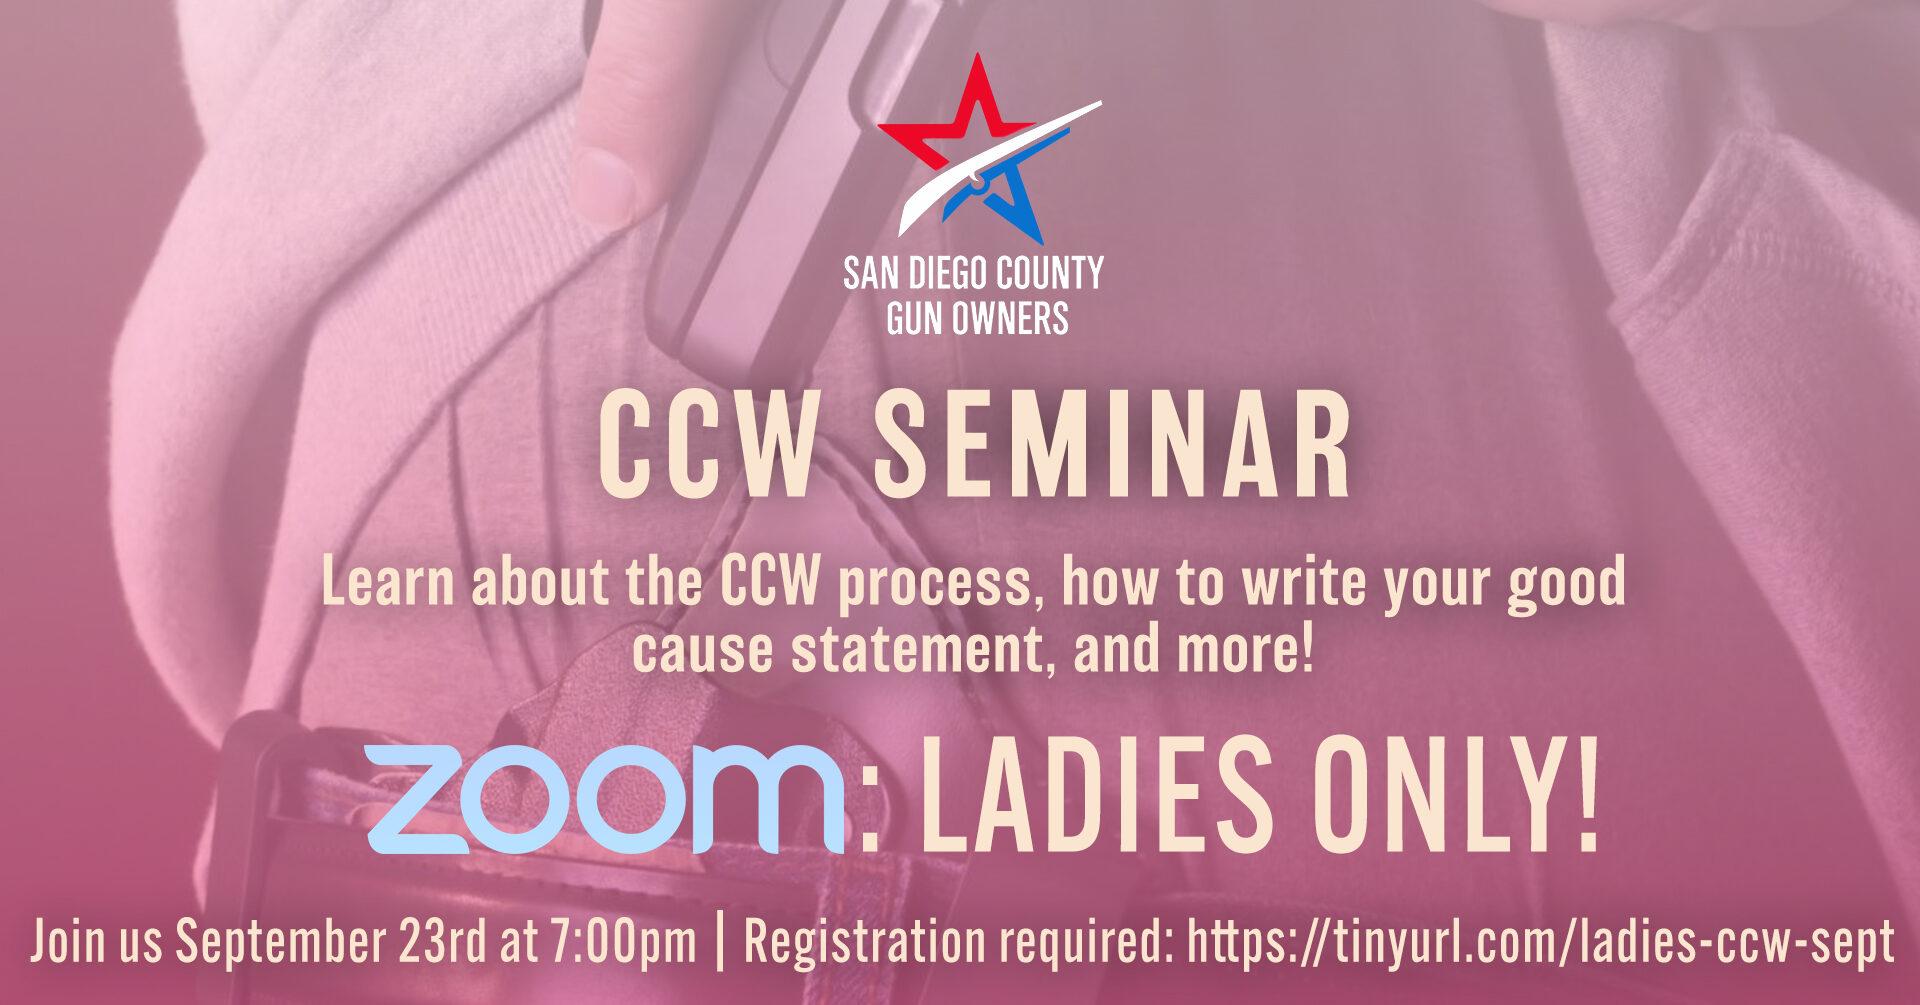 SD_CCW_Sep_Ladies